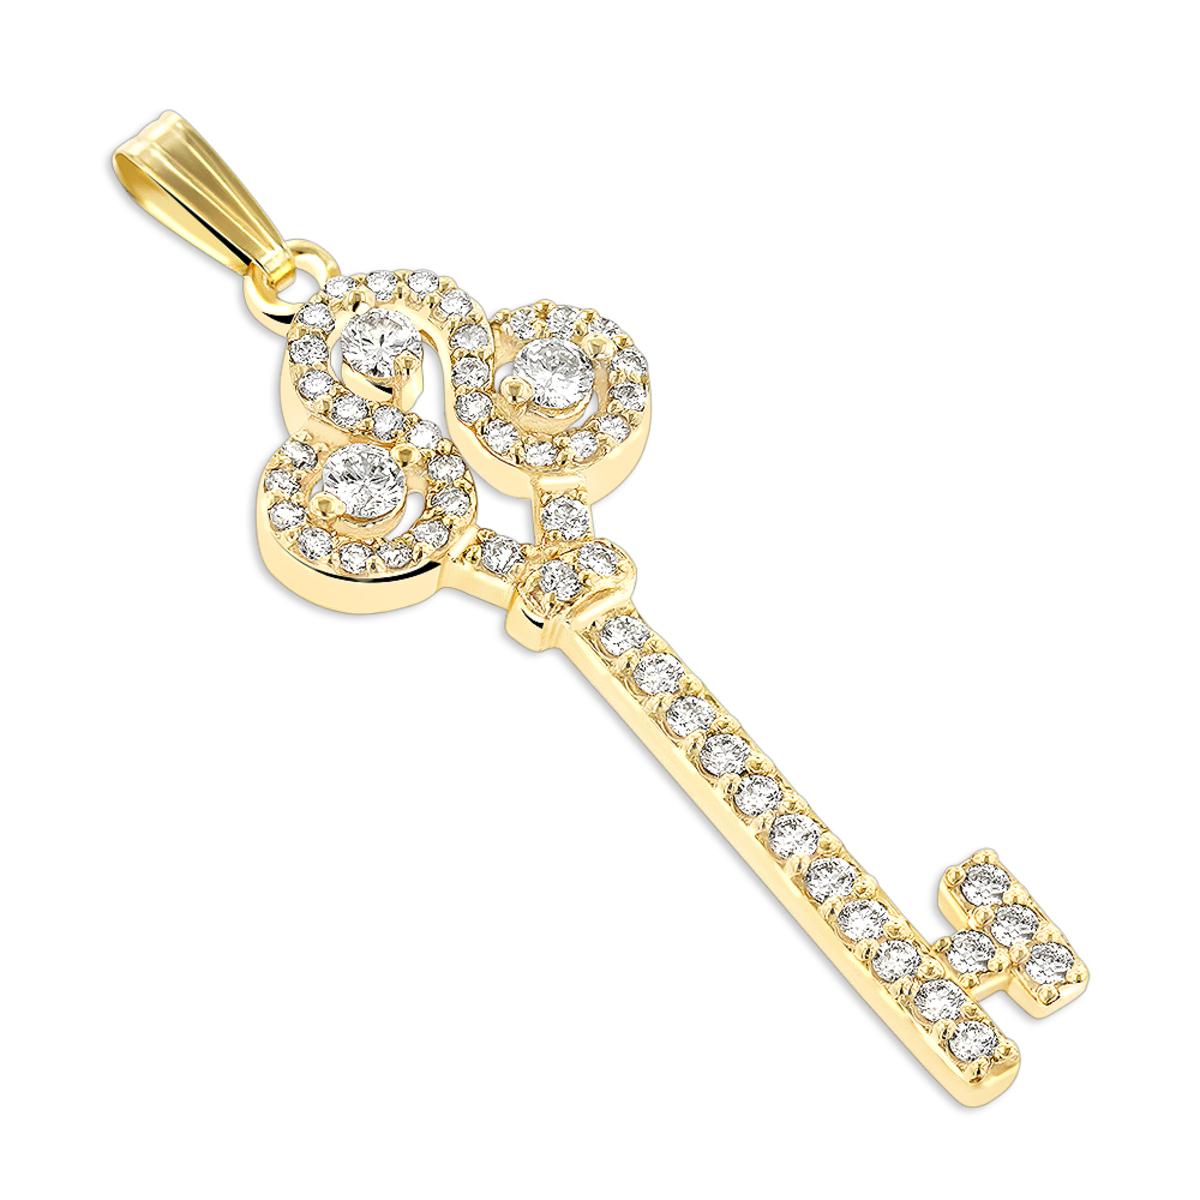 Ladies Necklaces 14K Gold Diamond Key Pendant 2 carats